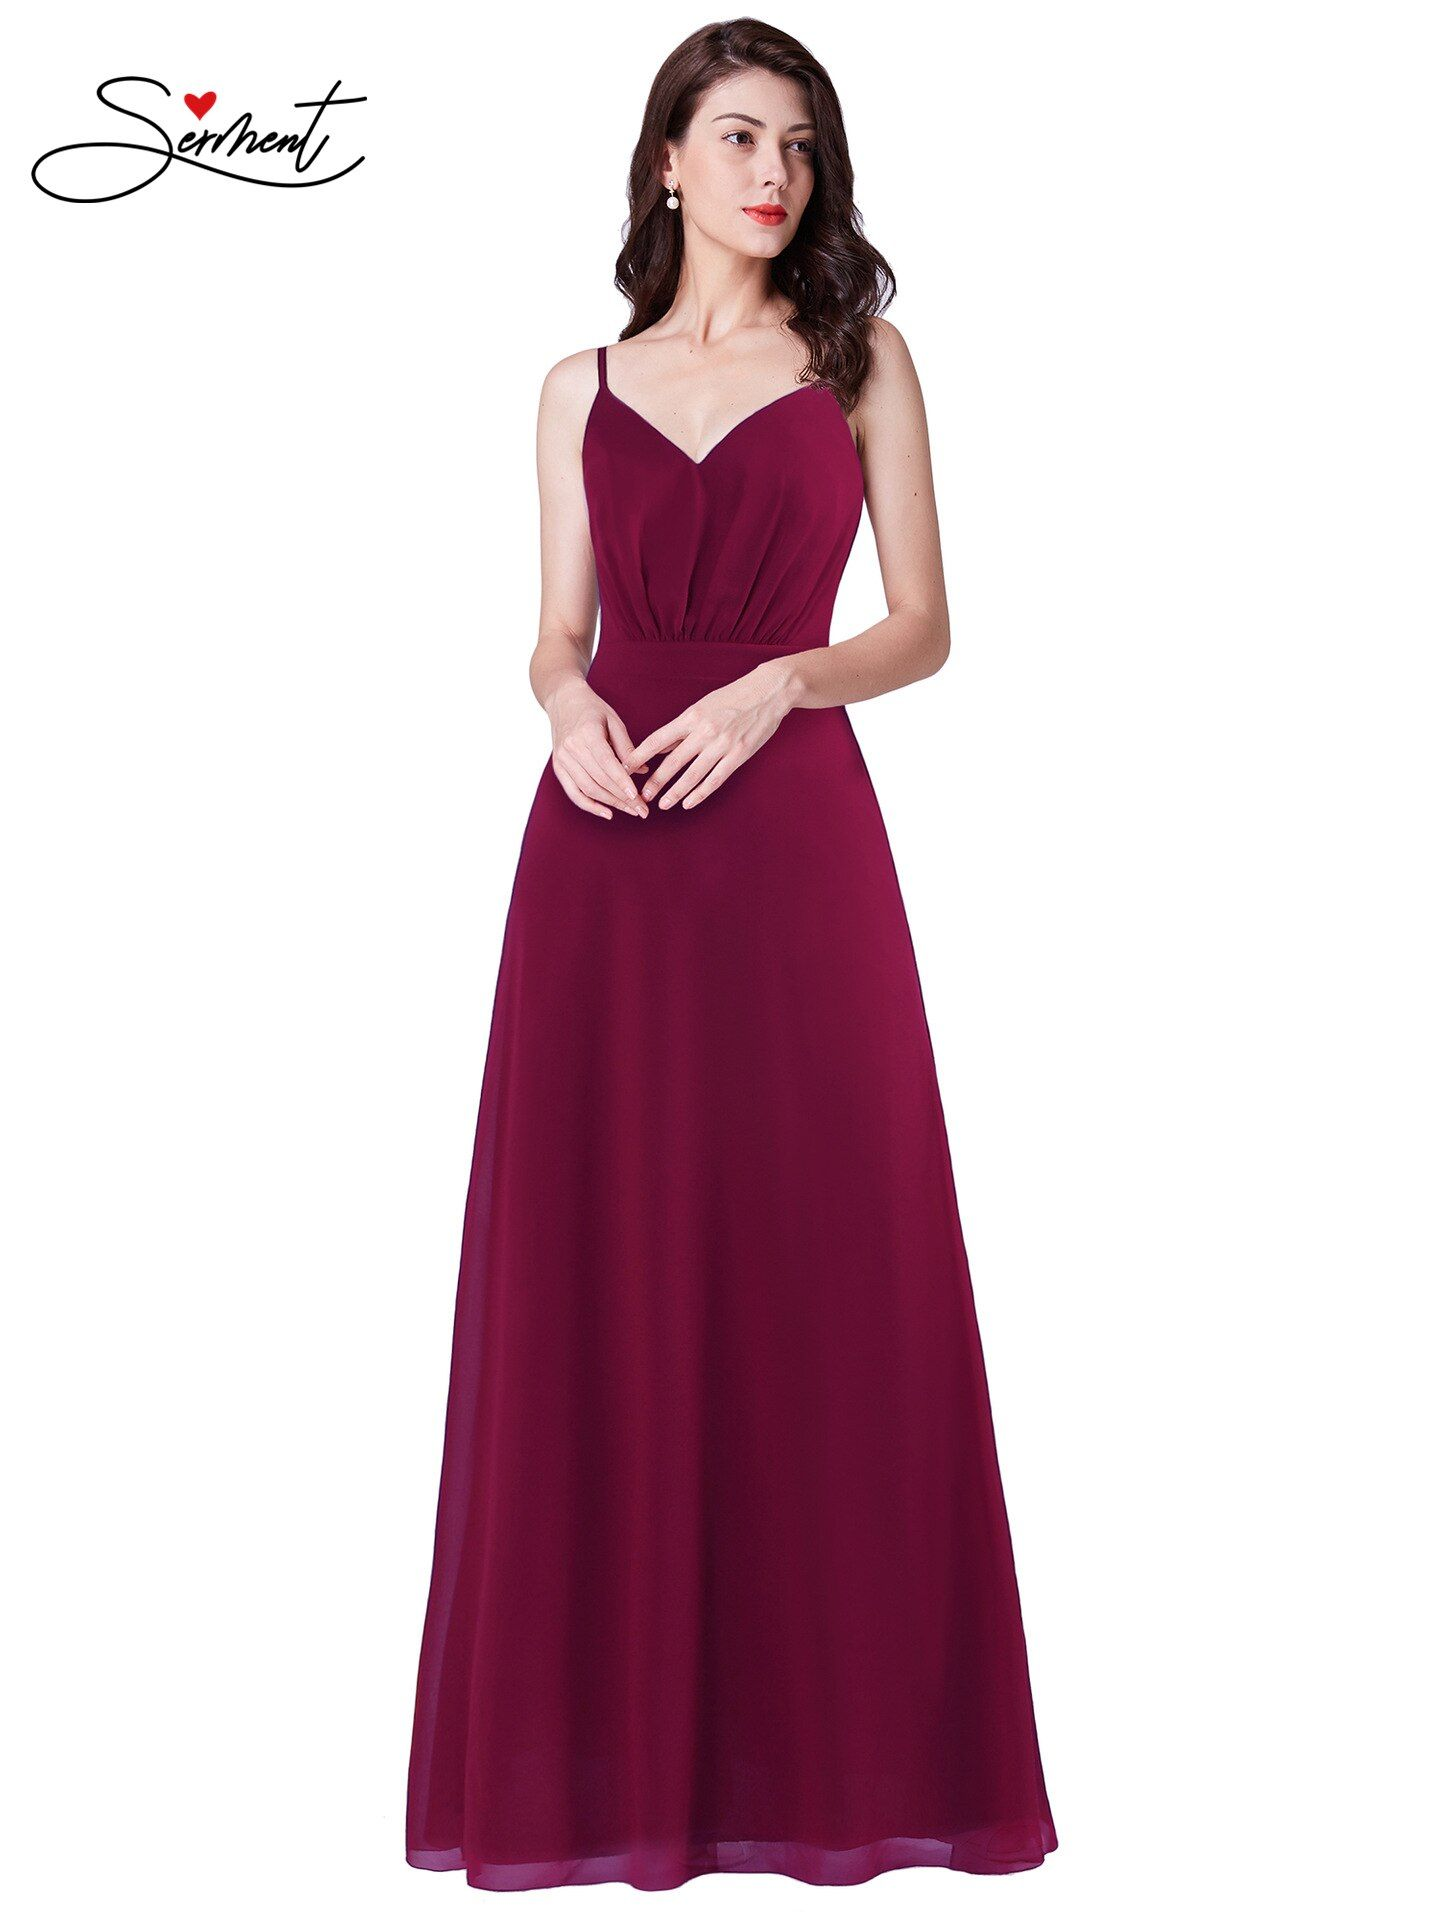 New Elegant Woman Evening Gown Summer Suspender Wine Red Elegant Noble Evening Dress Suitable For Formal Parties Evening Gowns Evening Dresses Elegant Woman [ 1920 x 1440 Pixel ]